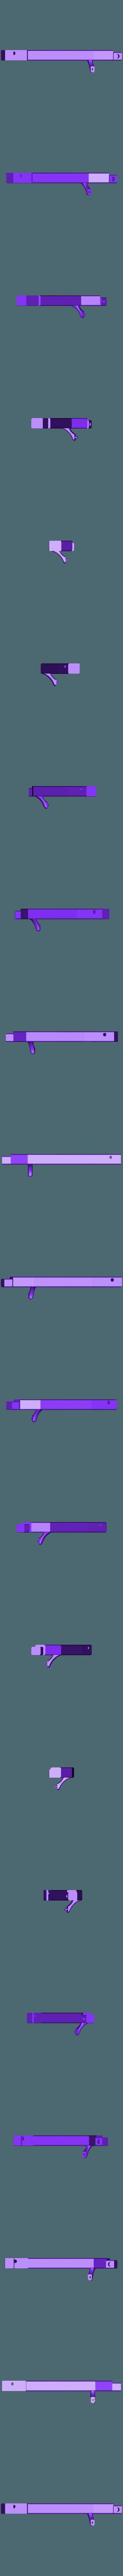 10TRK-LHS-FR-LOW.stl Download STL file Ratrod Pickup • 3D printing template, macone1